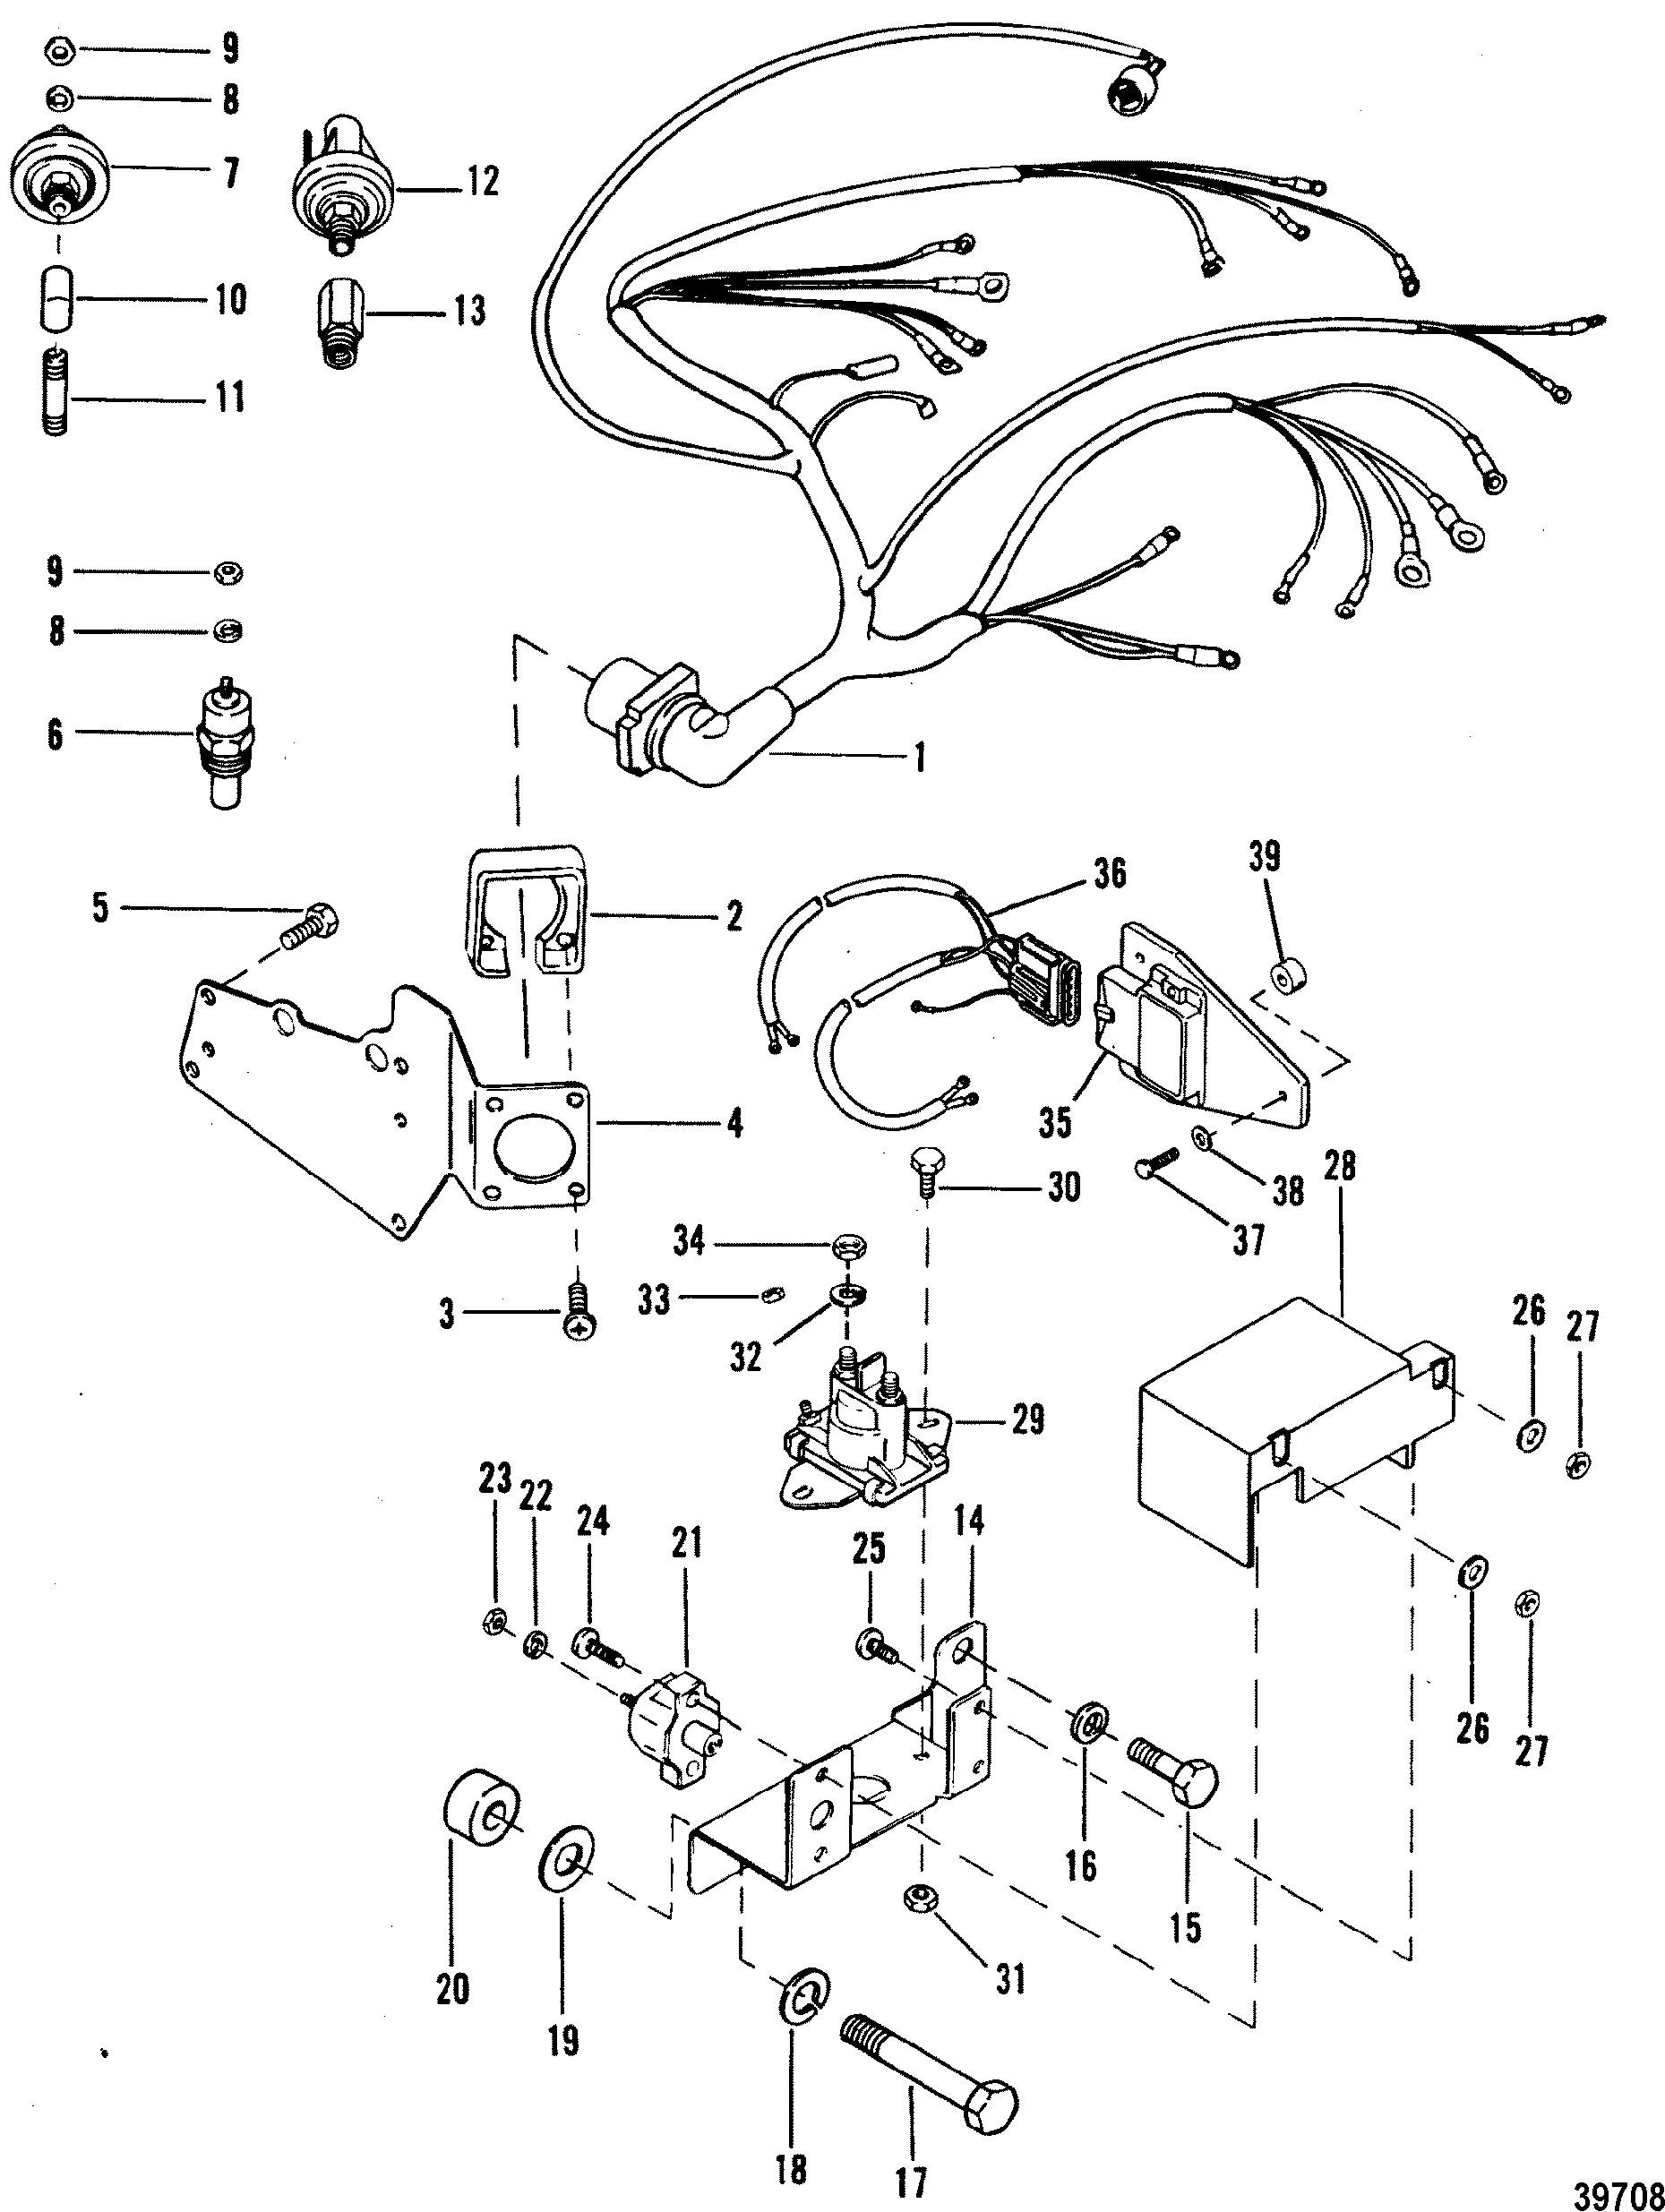 hight resolution of wiring diagram mercruiser 454 wire center source 4 3lx mercruiser wiring schematic images gallery